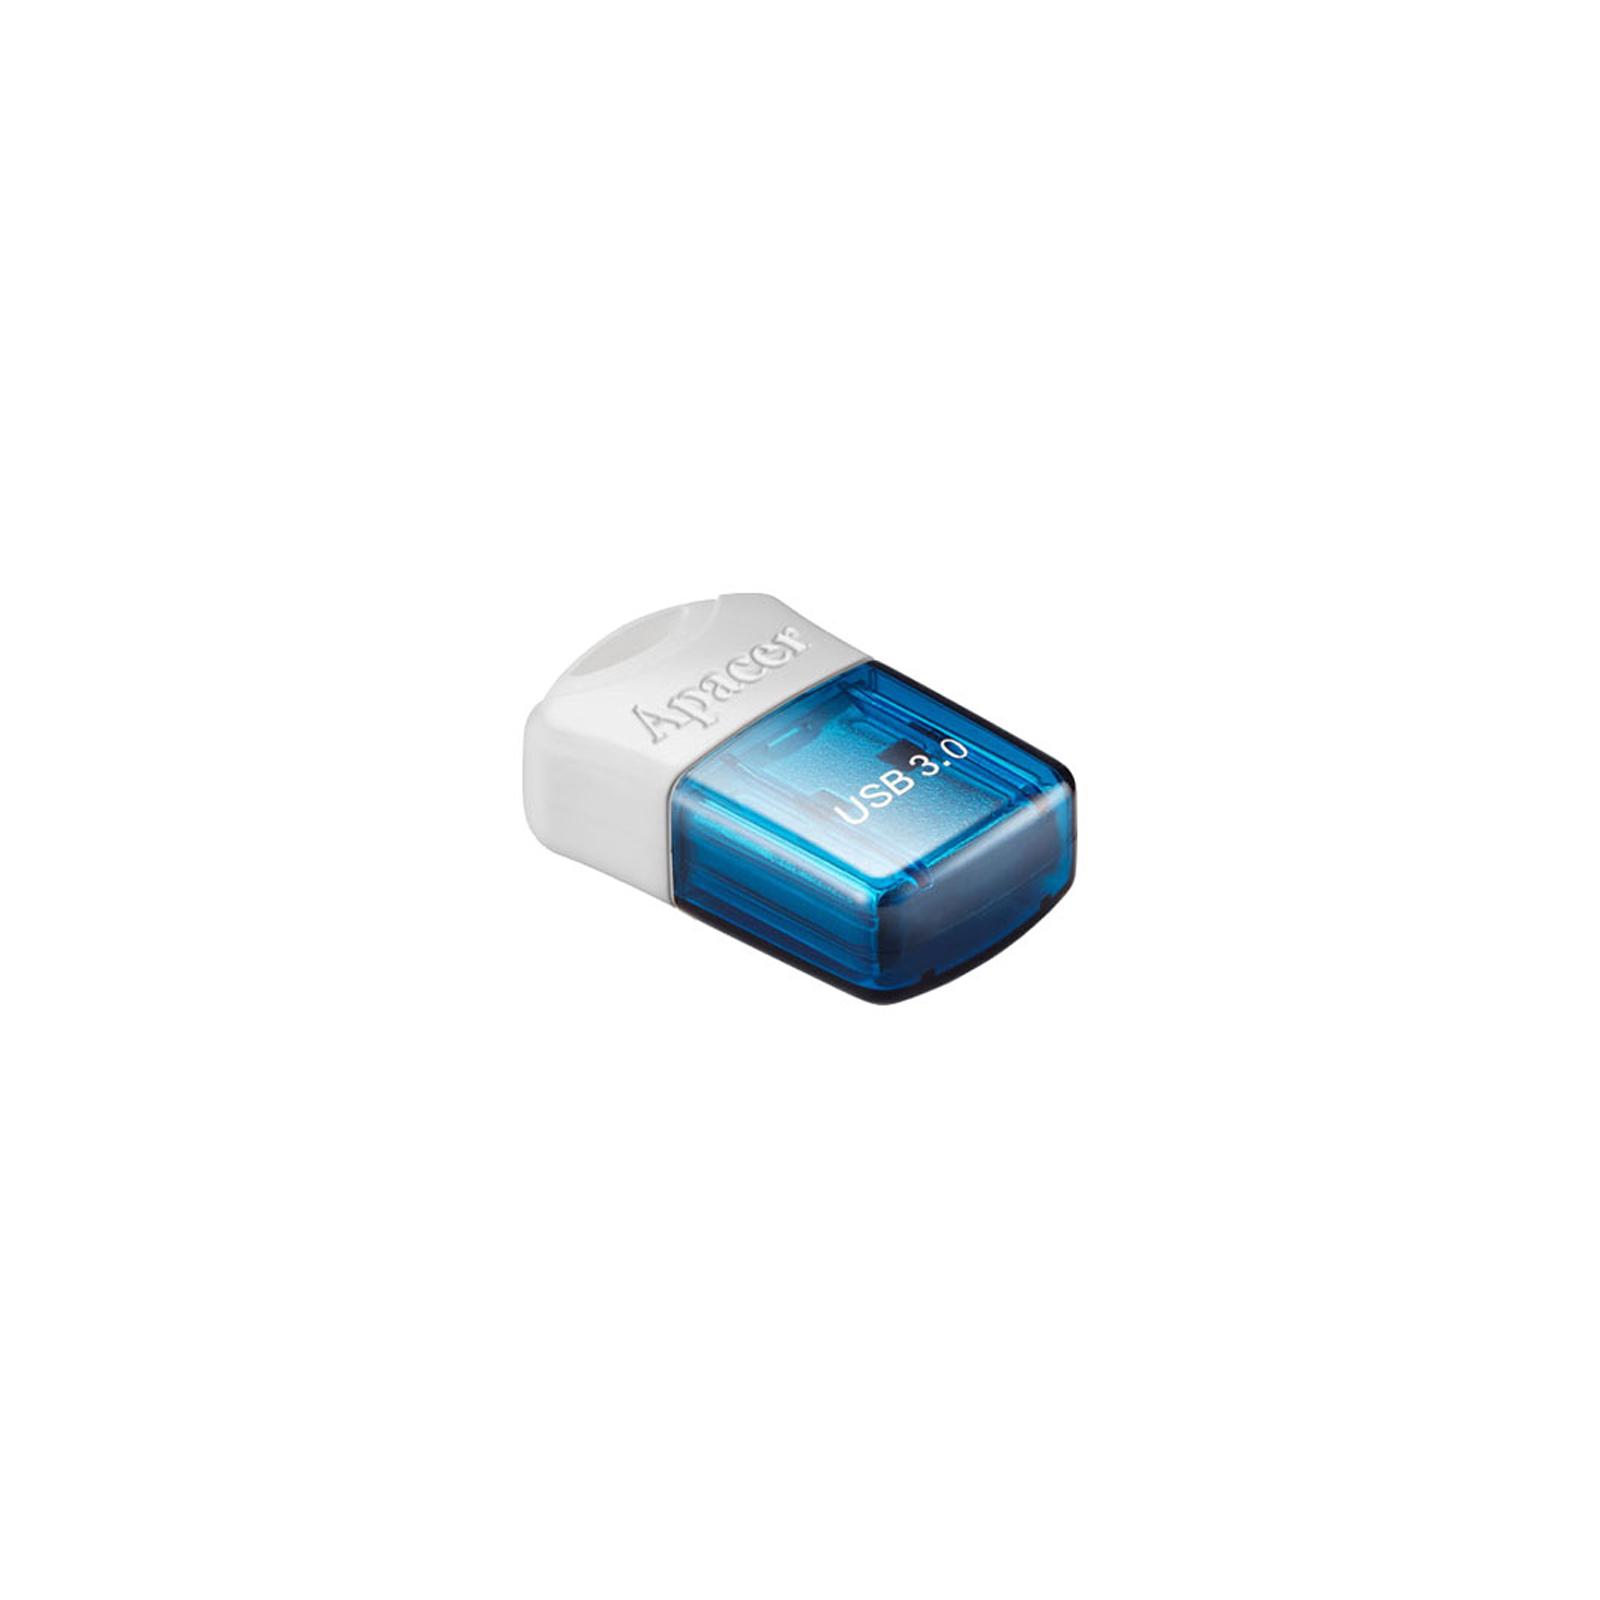 USB флеш накопитель Apacer 8GB AH157 Red USB 3.0 (AP8GAH157R-1) изображение 3